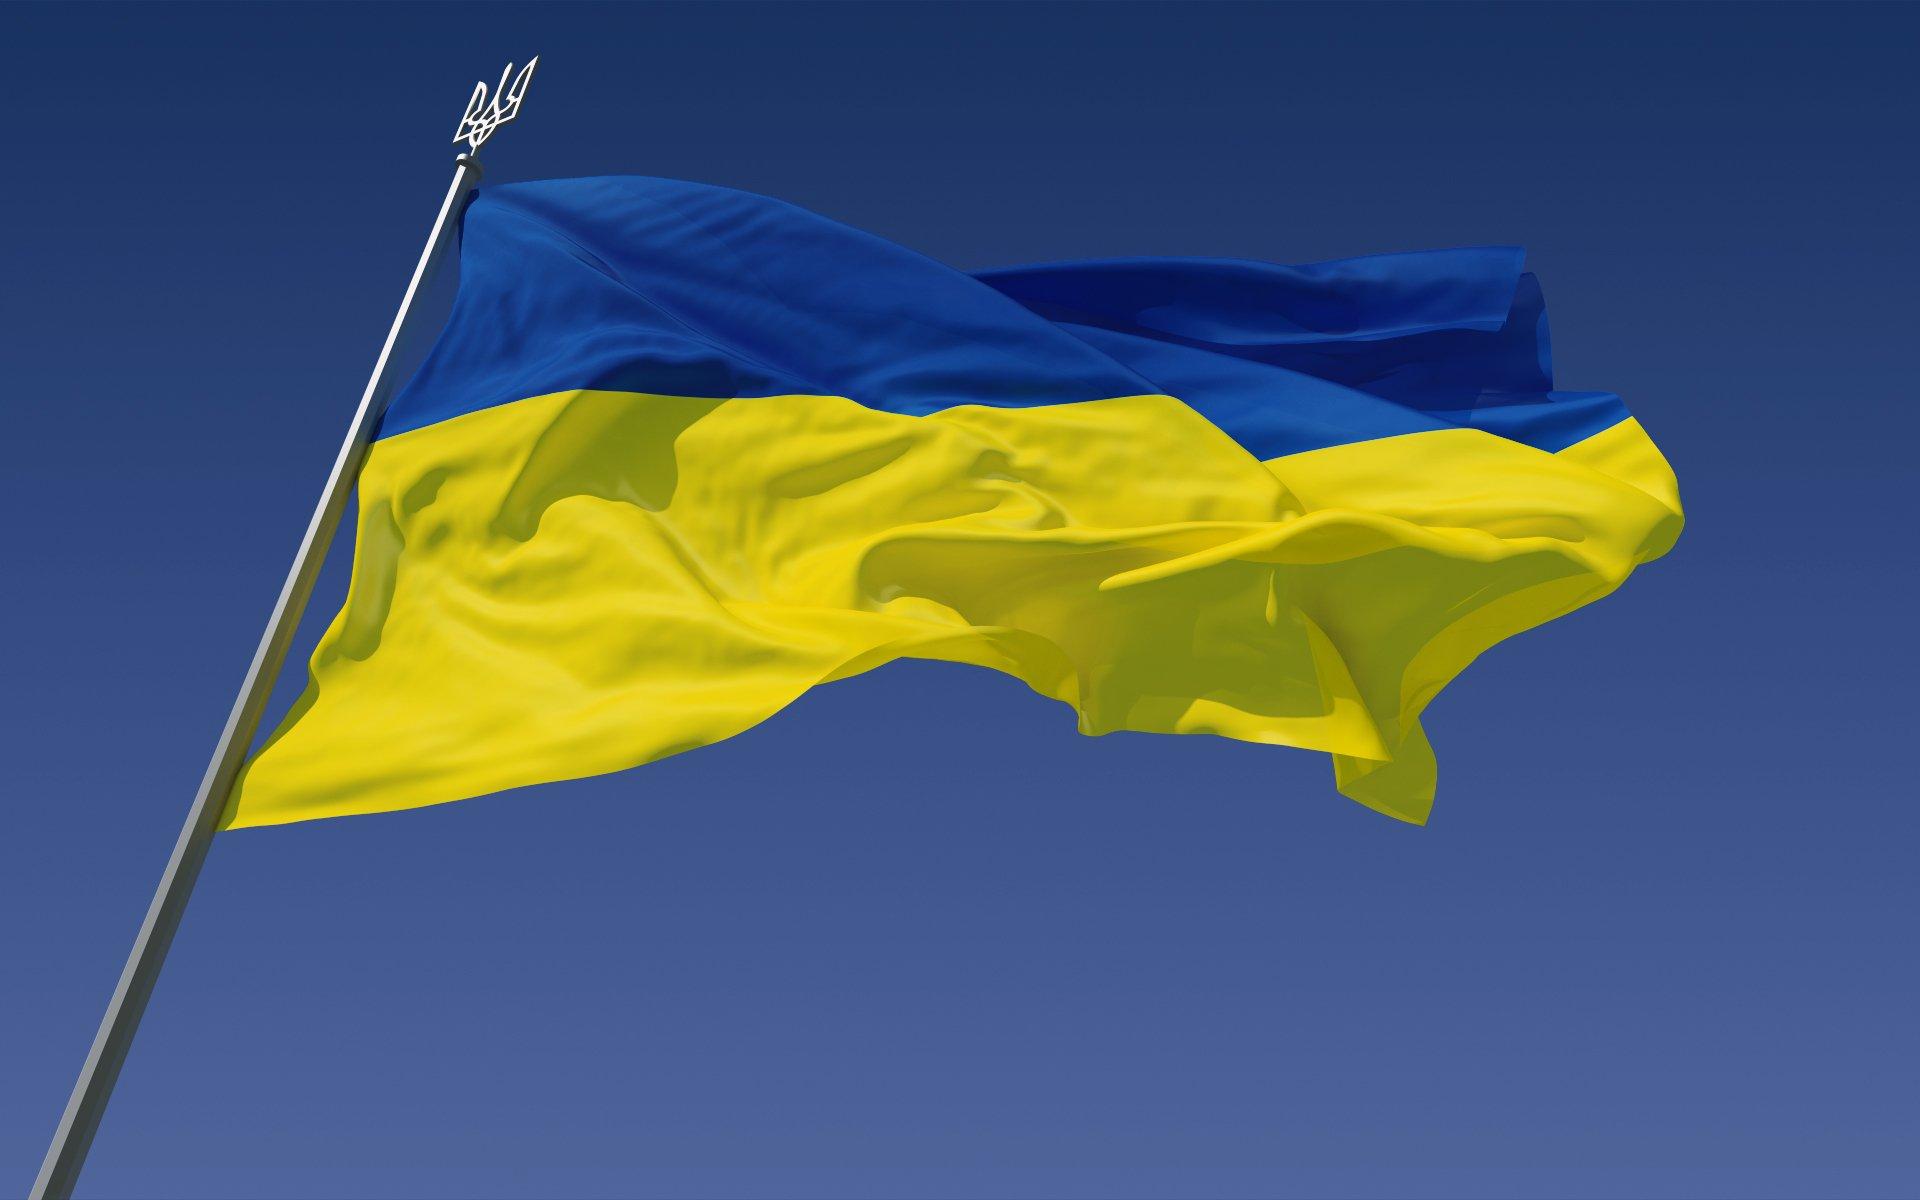 мужчинах картинка прапора украины яркий тому пример